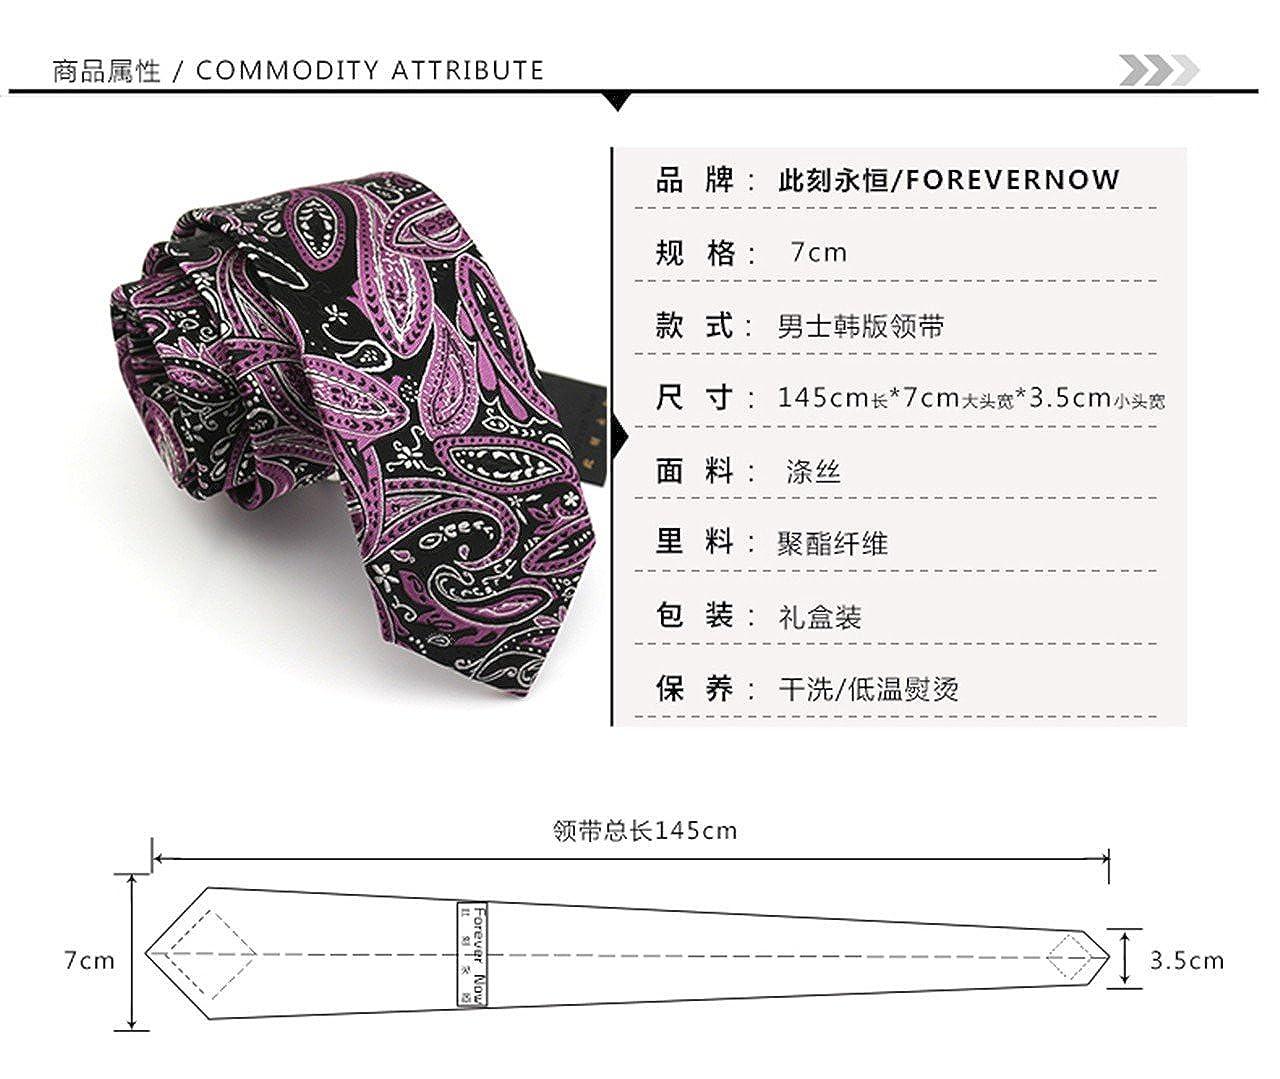 HXCMAN 7cm black purple flower floral 100/% silk classic design men tie necktie all-match party business evening wedding groom in gift box